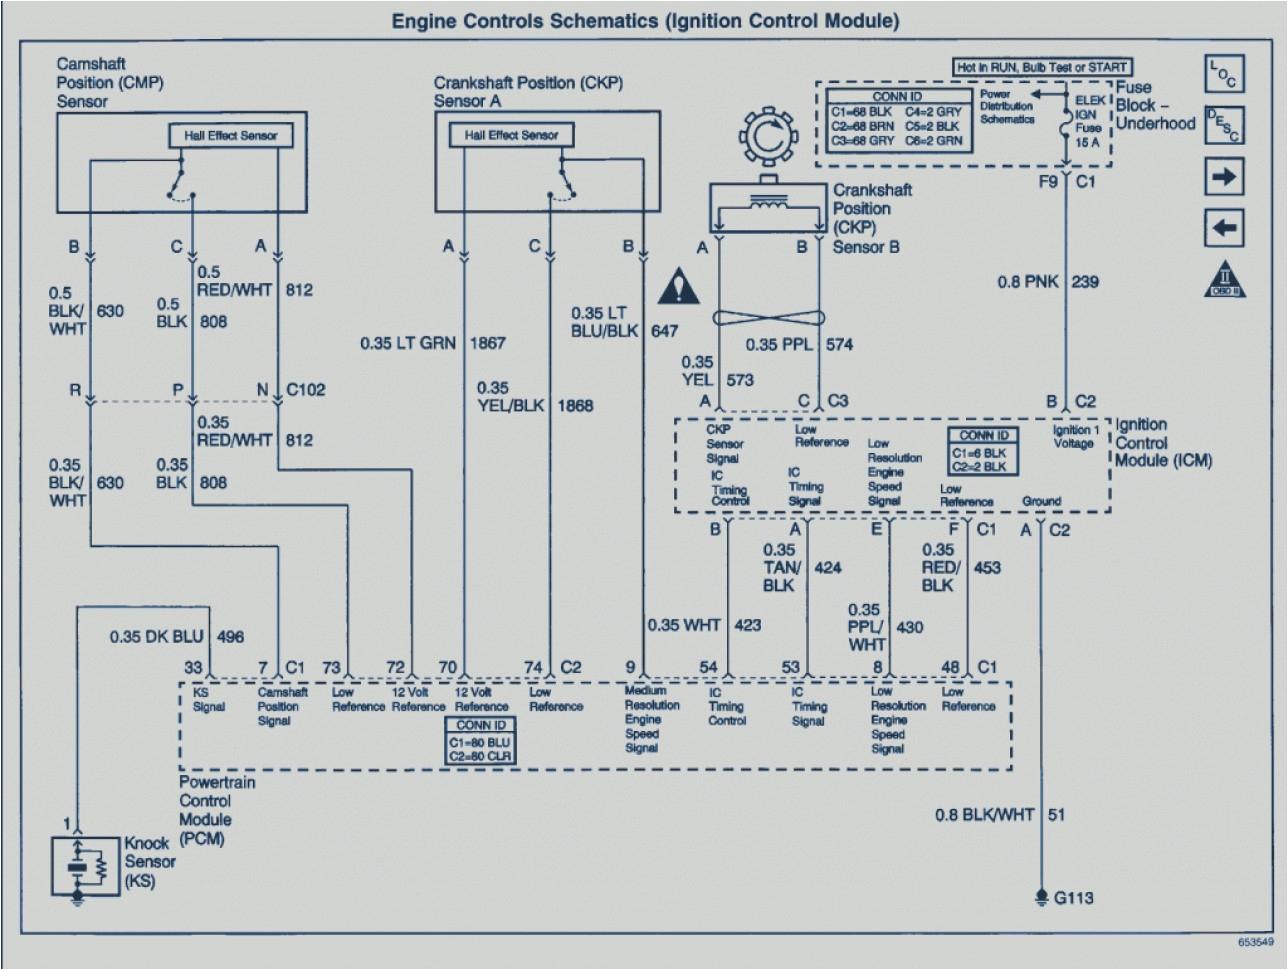 97 grand prix wiring diagramThat's Me!